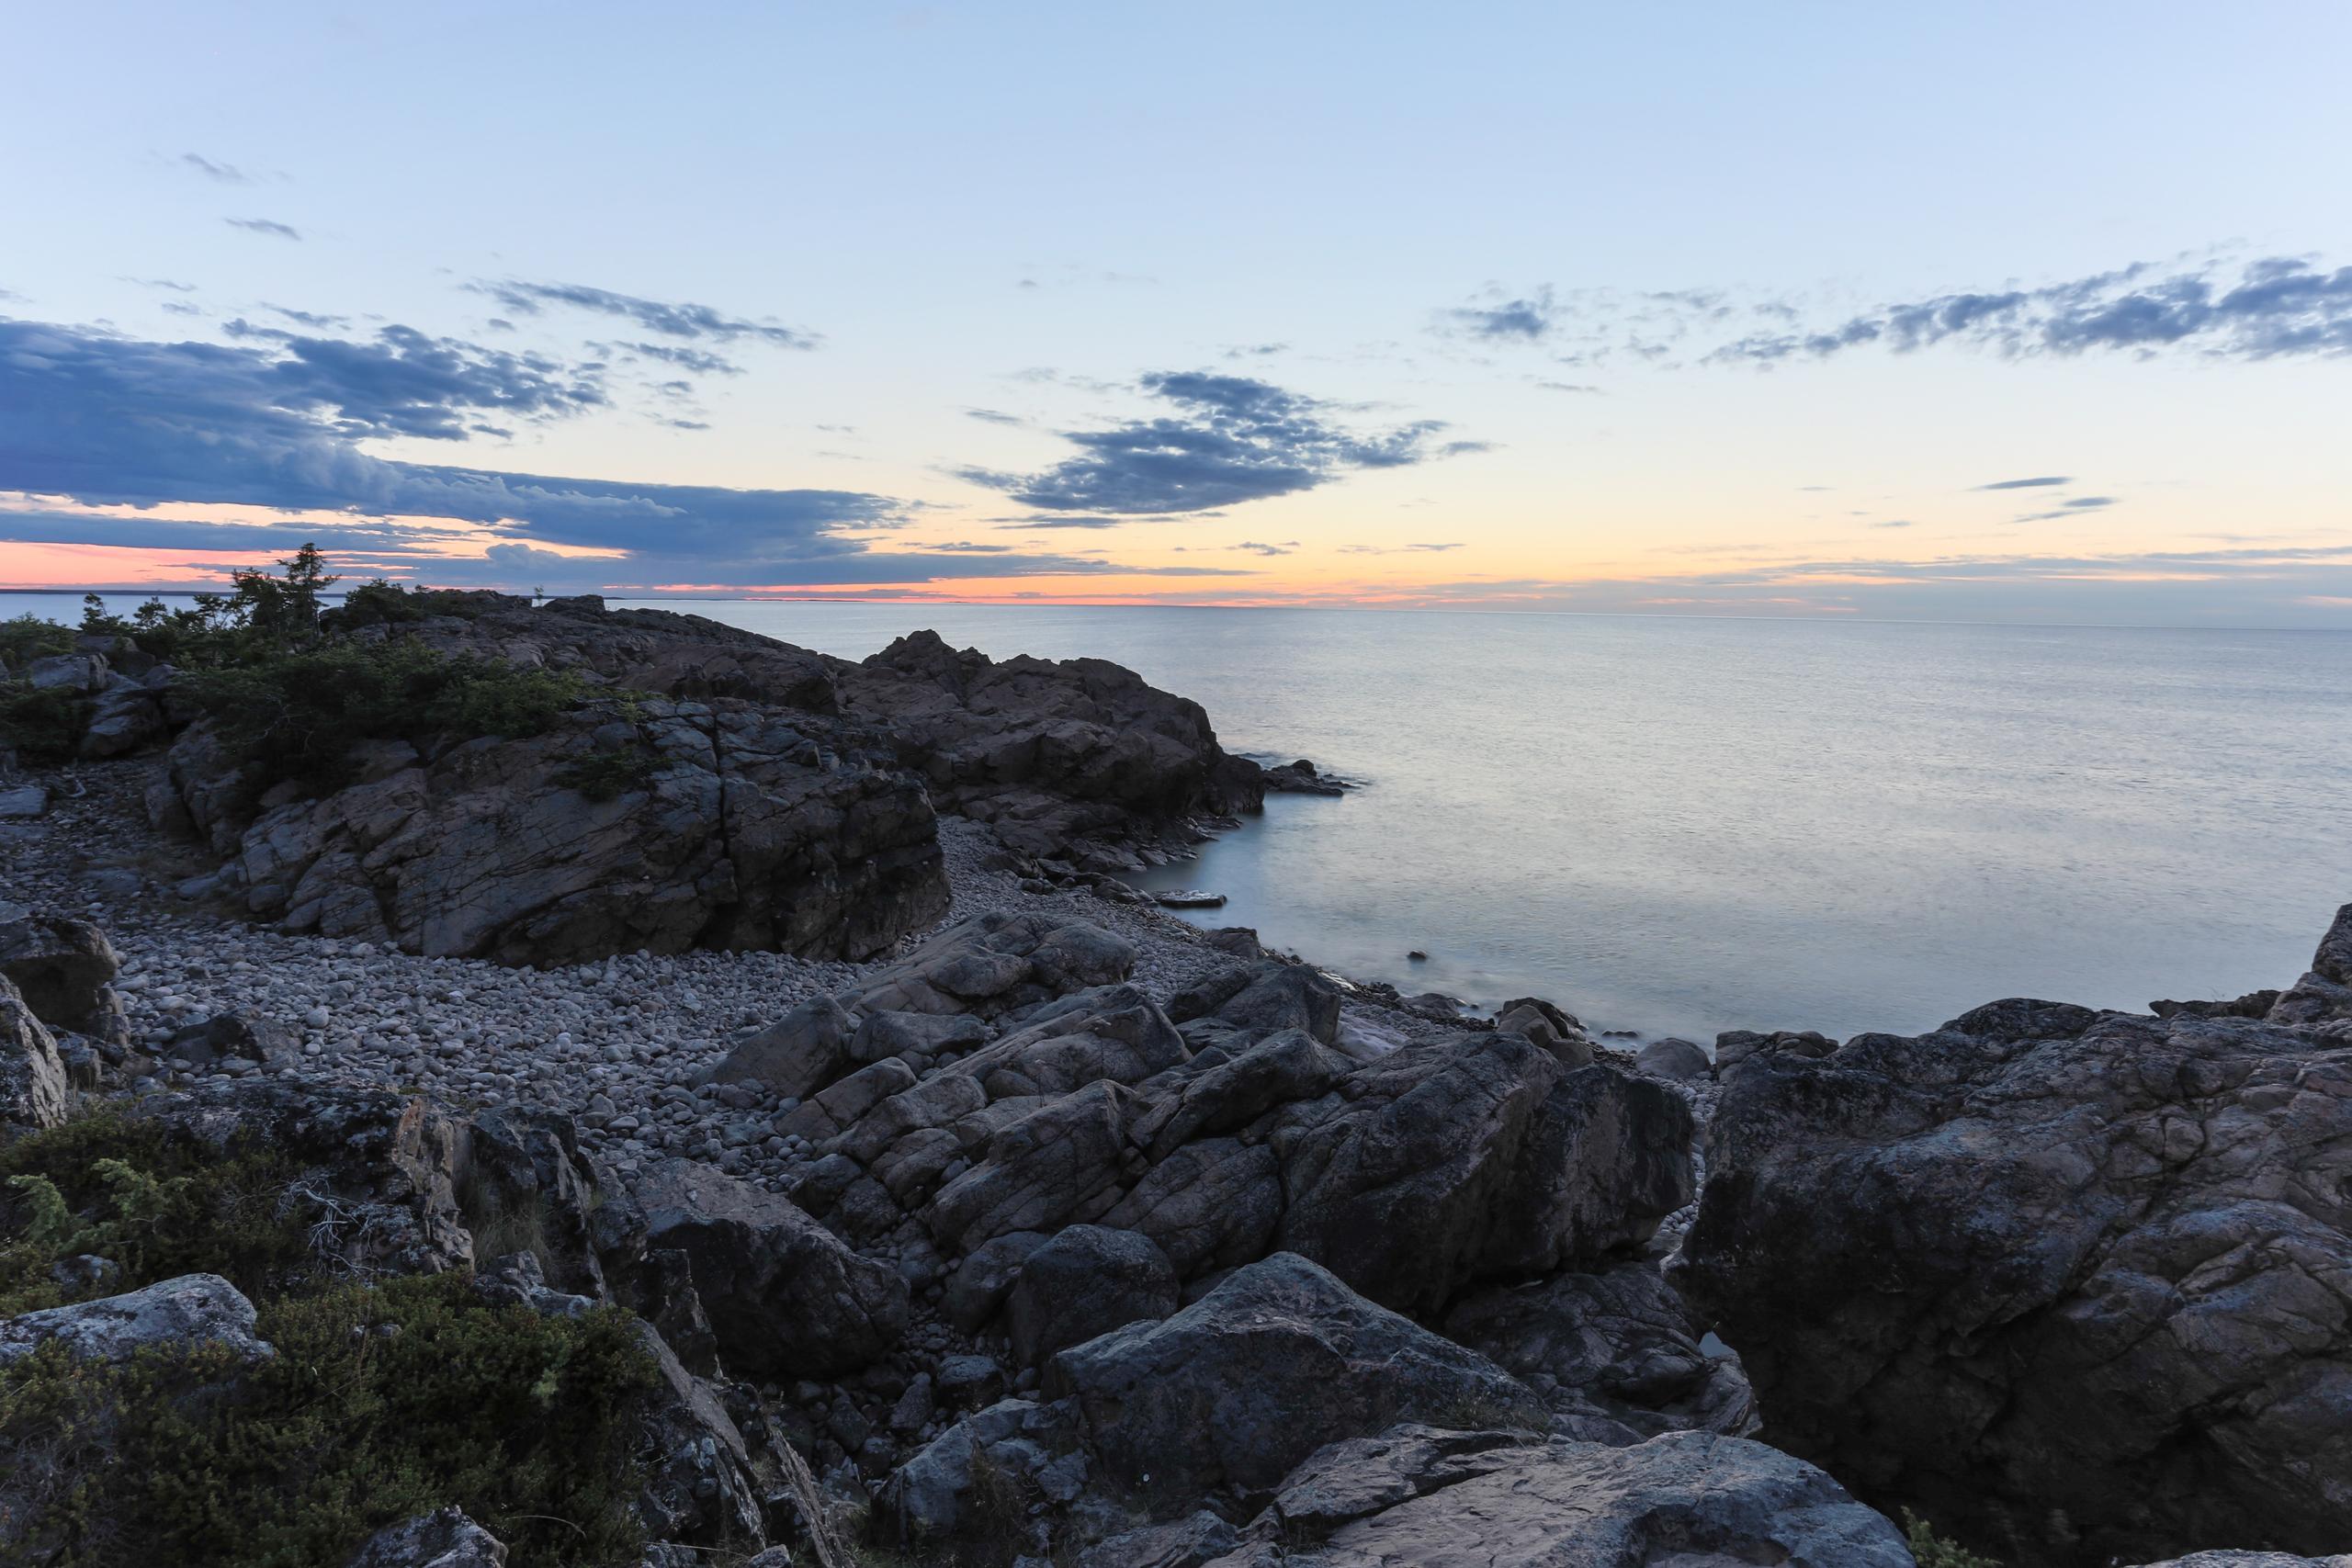 08072016-kapplasse-naturreservat-4